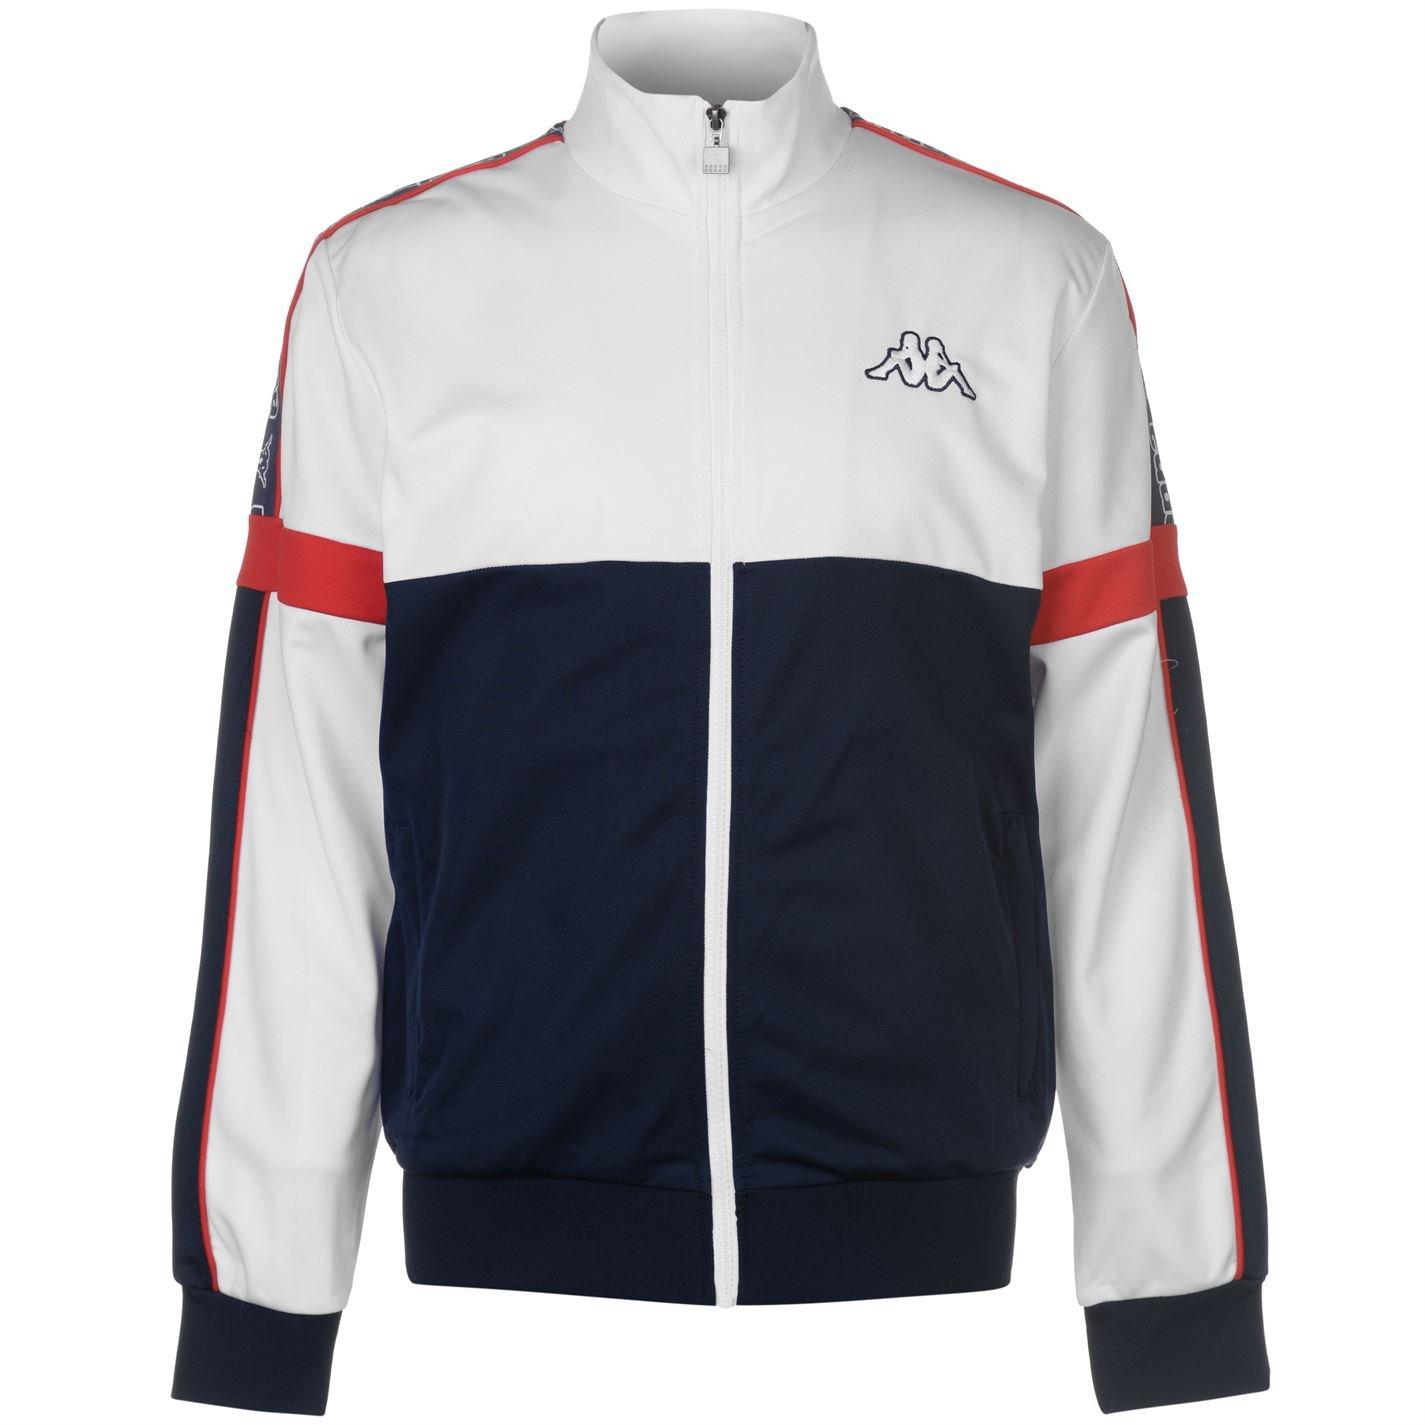 Kappa Mens Panel Jacket Tracksuit Top Coat Long Sleeve Zip Full Block Colour White Large by Kappa